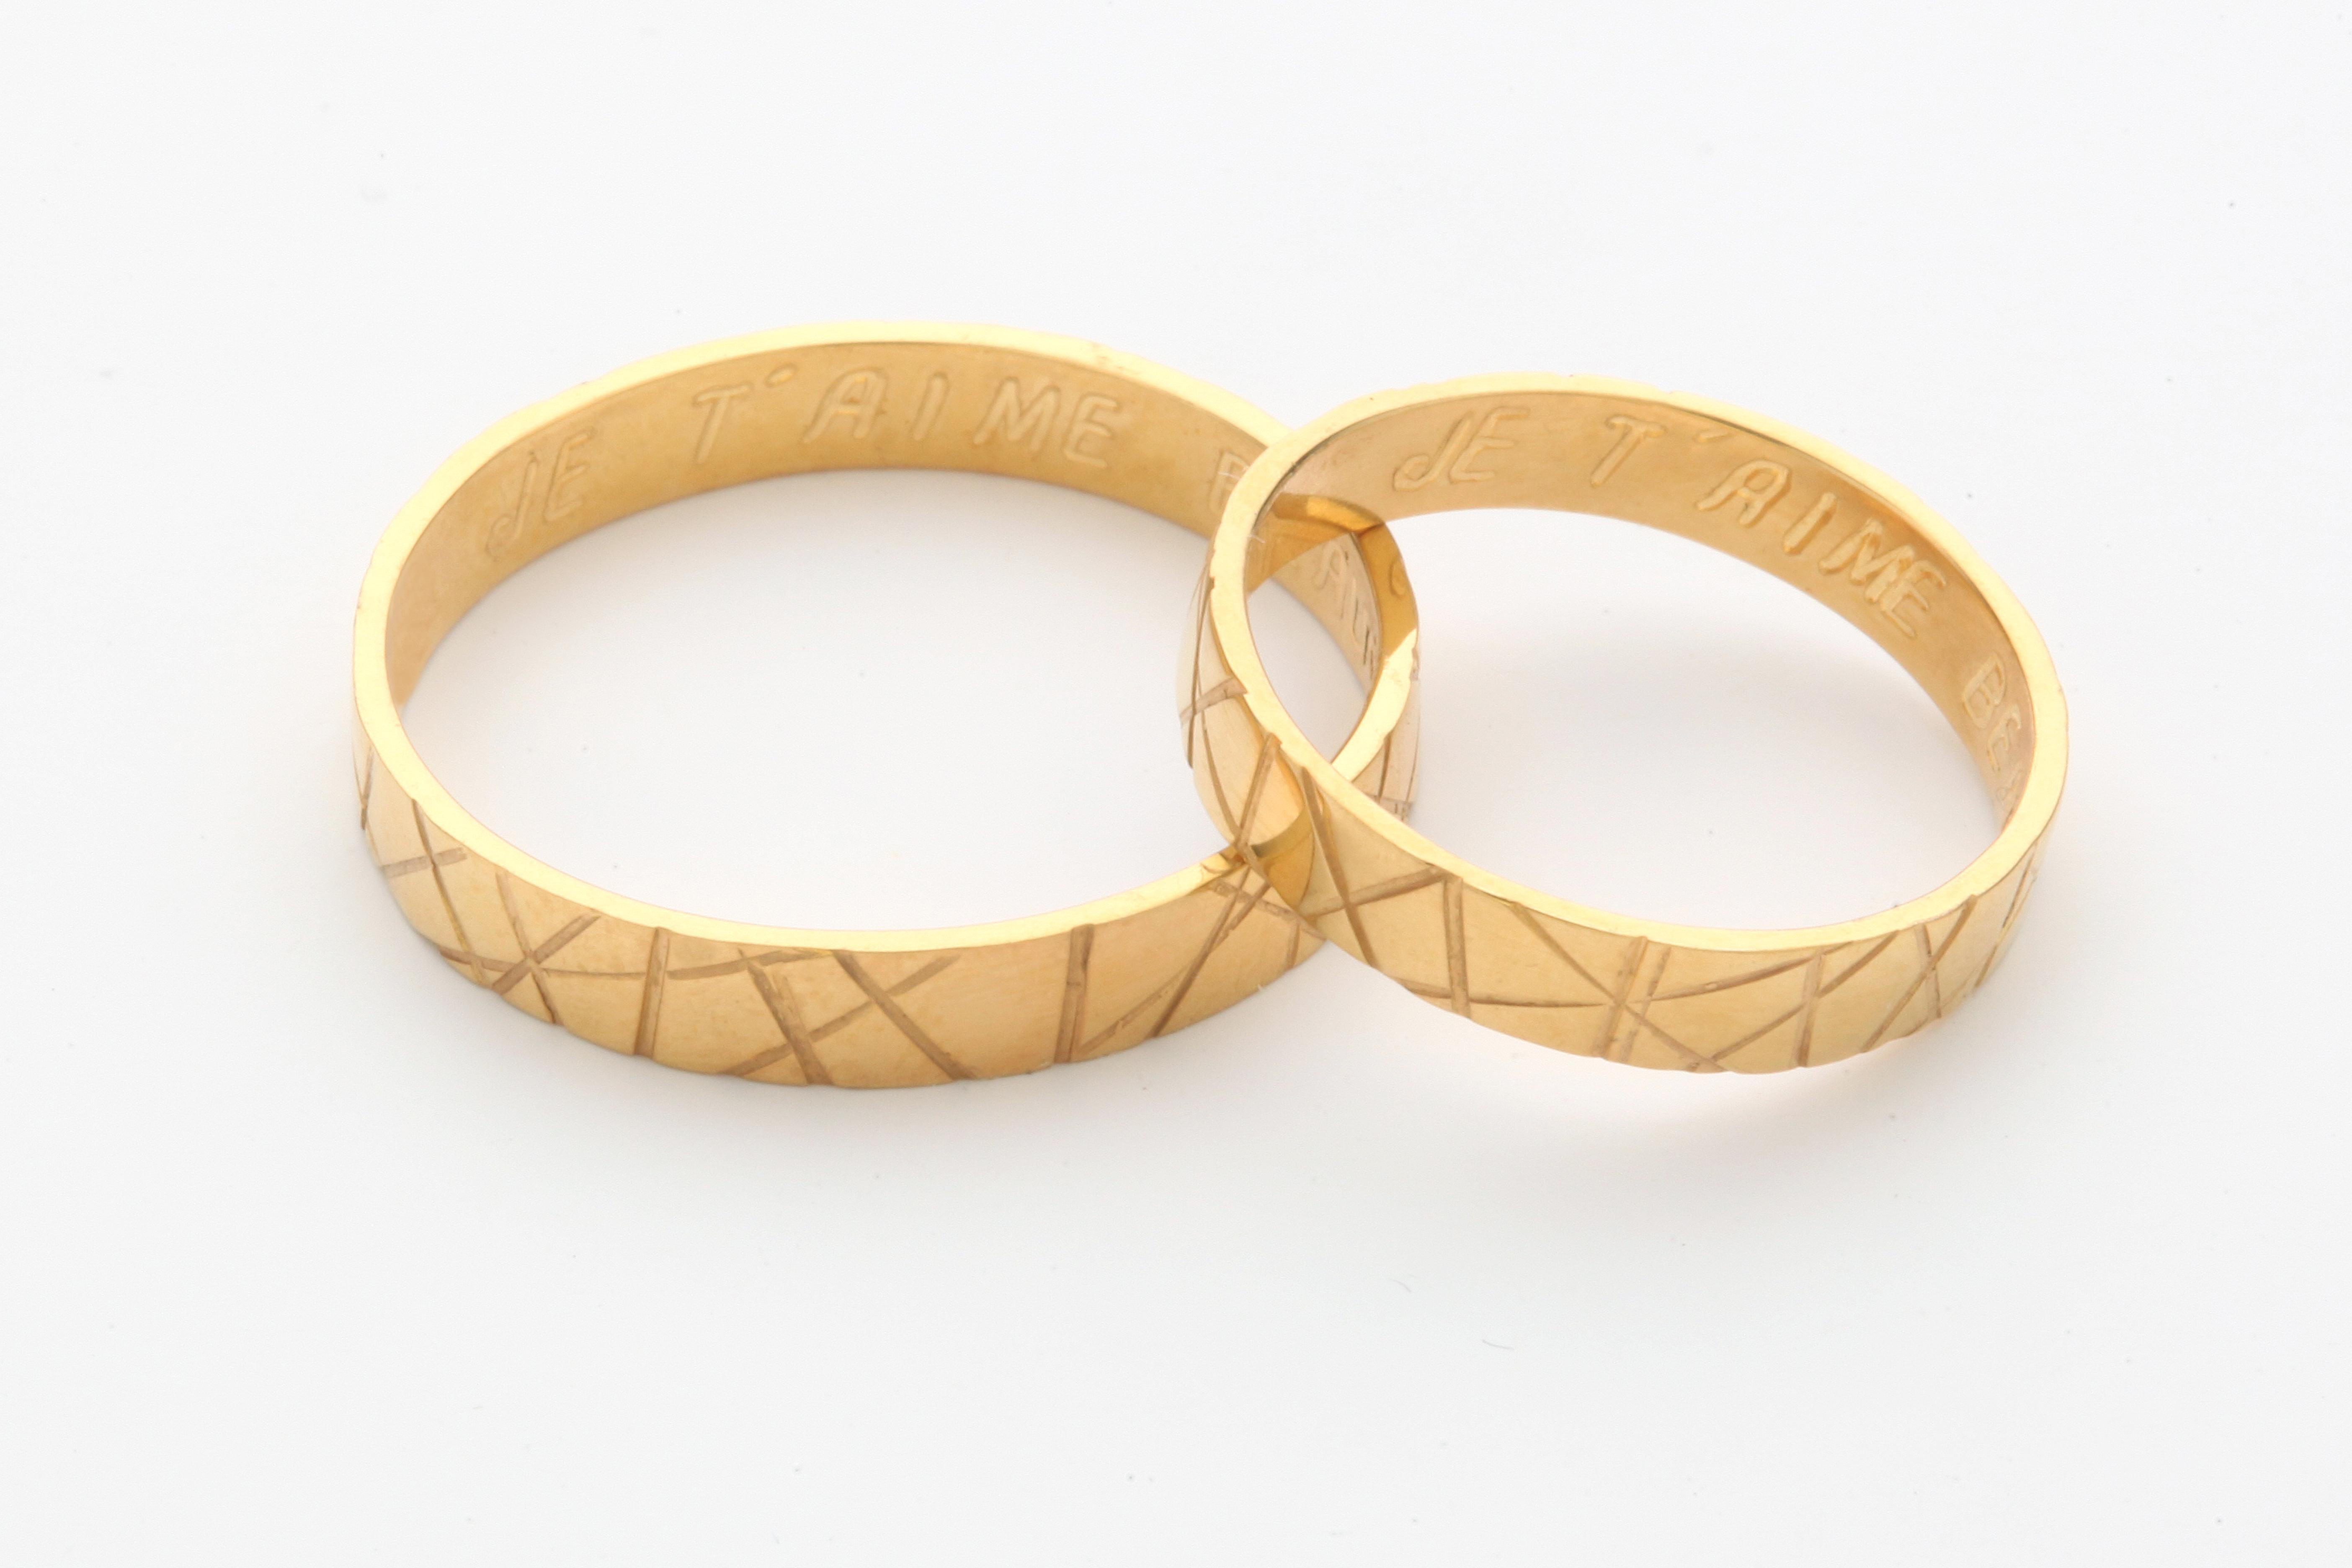 Alianzas de oro amarillo con textura